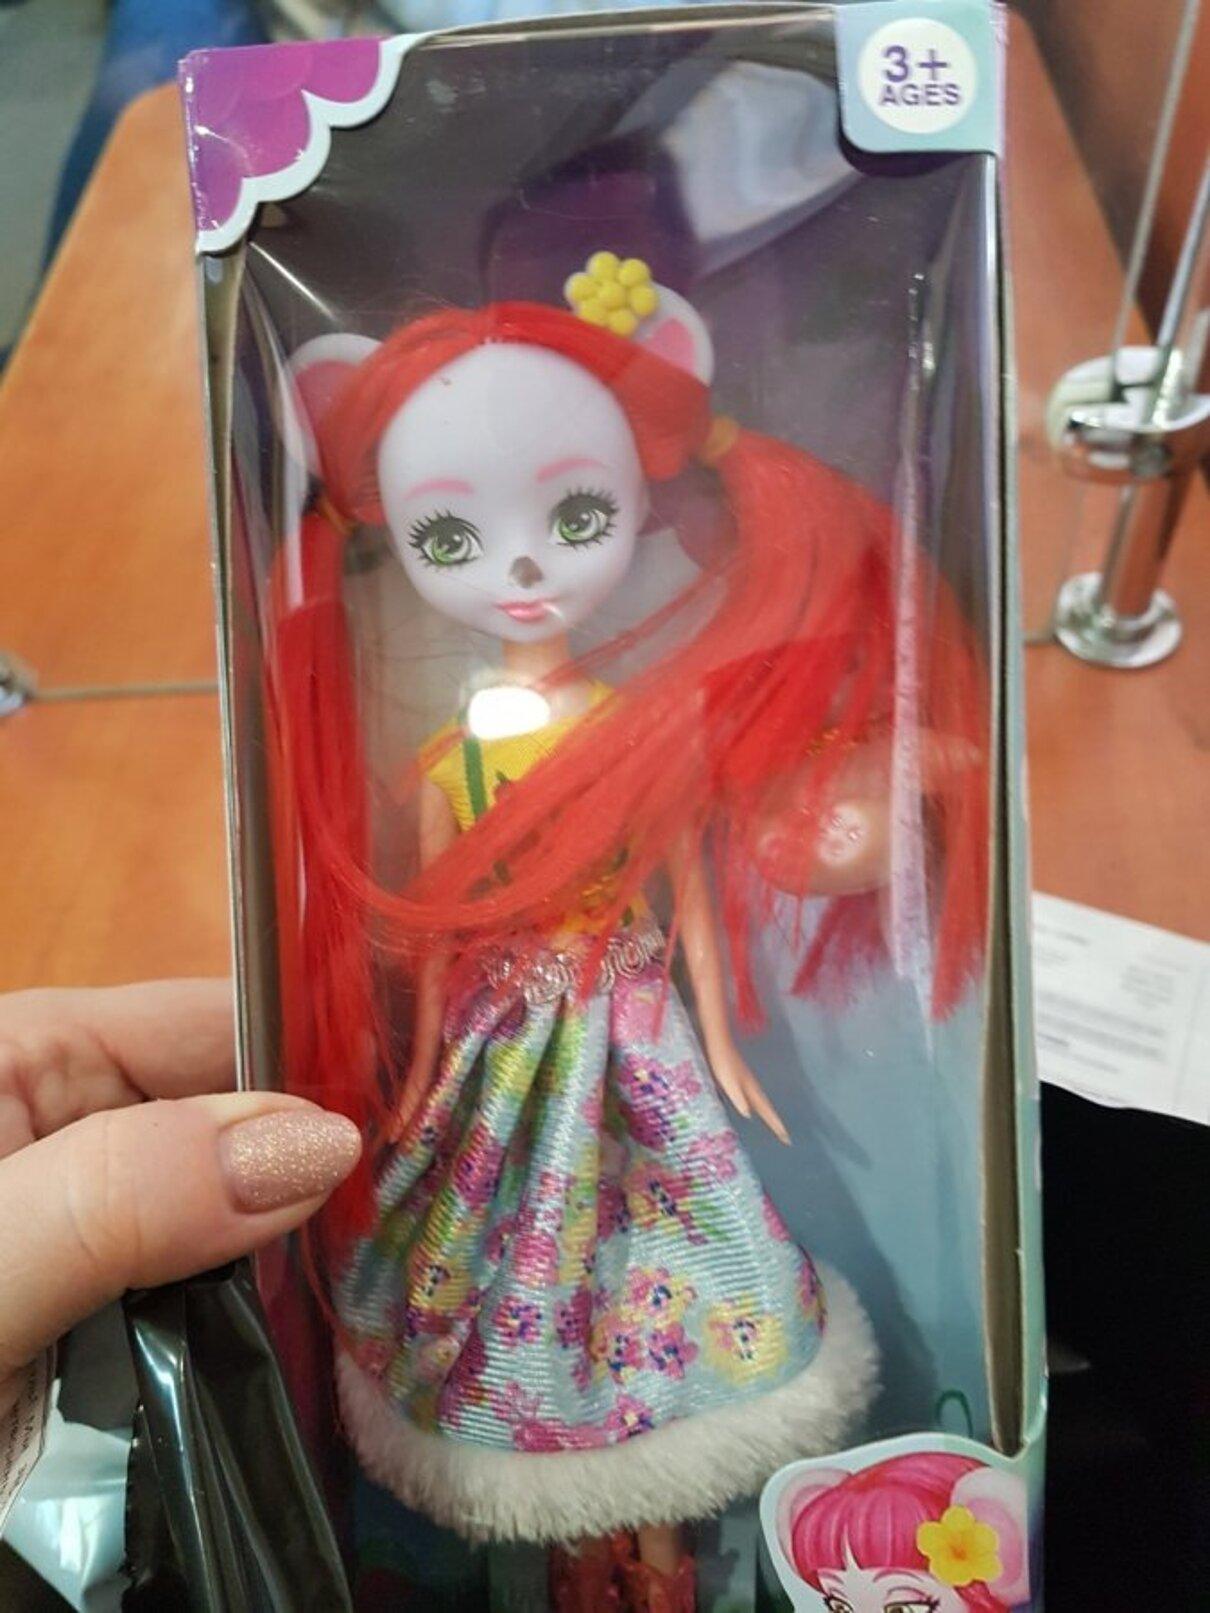 Жалоба-отзыв: Кукла-блайз.рф - Мошенники.  Фото №1